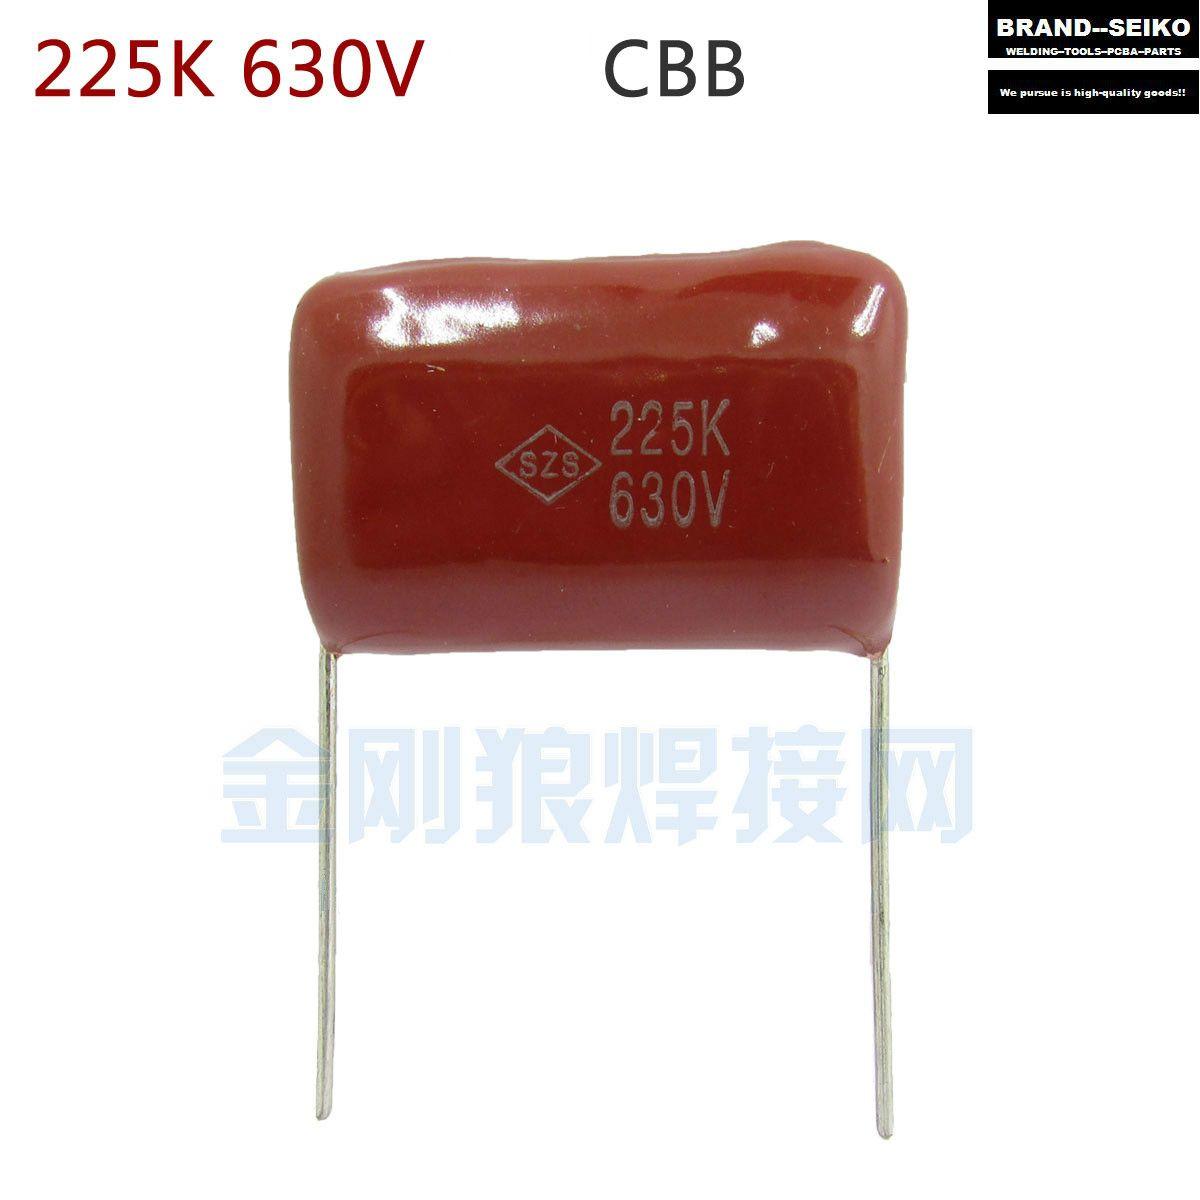 10pcs Lot 225 K 630 V Capacitor Cbb Capacitance Feet From 31 Mm Commonly Used Inverter Welding Machine Mainten Inverter Welding Machine Welding Machine Welding